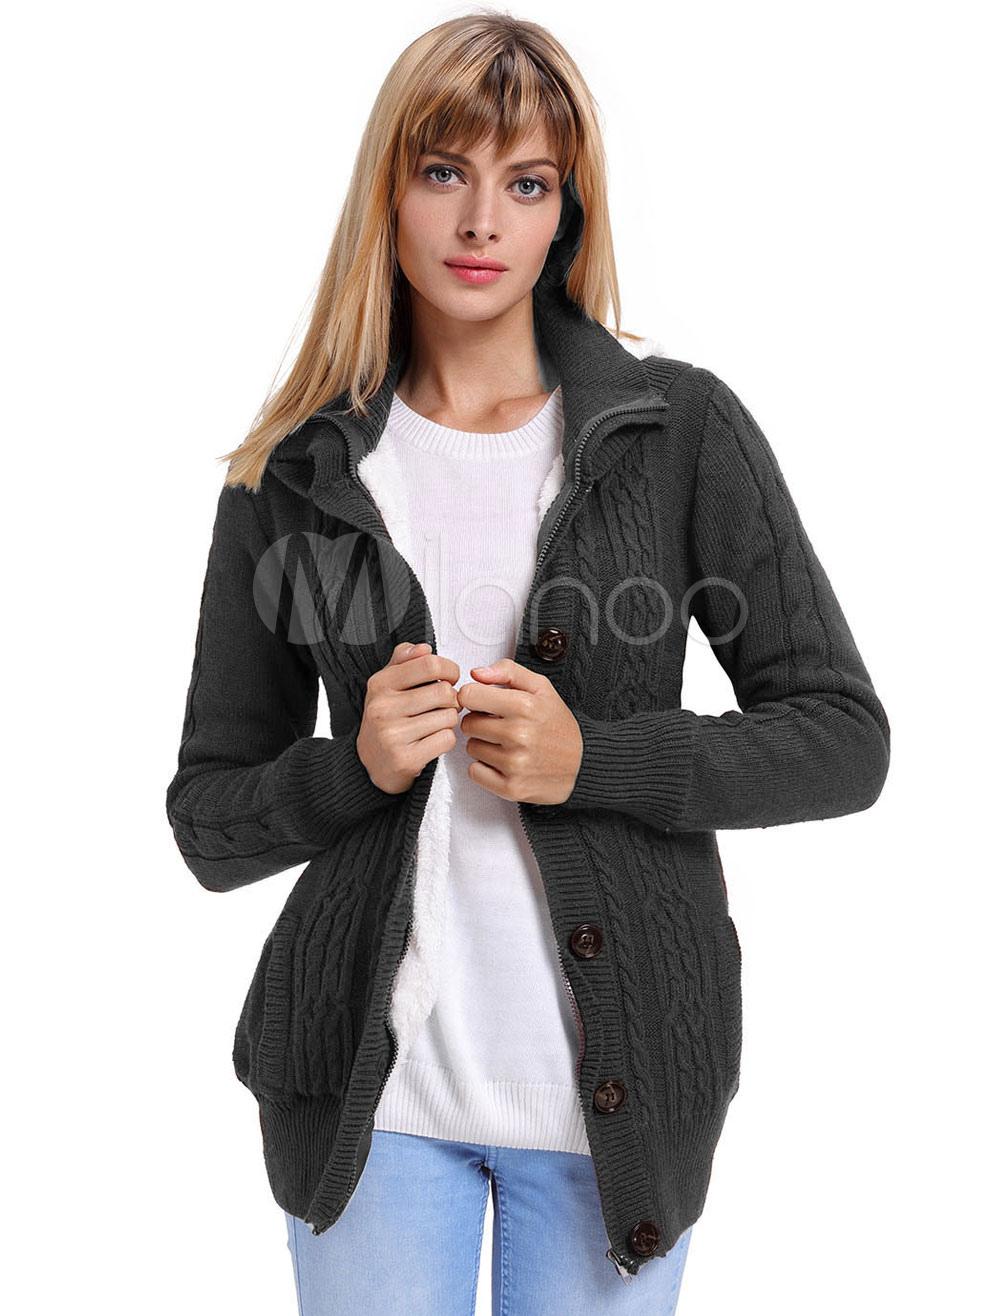 655ac52858cb Women Sweater Cardigan Hooded Buttons Chunky Cardigan Women Grey ...